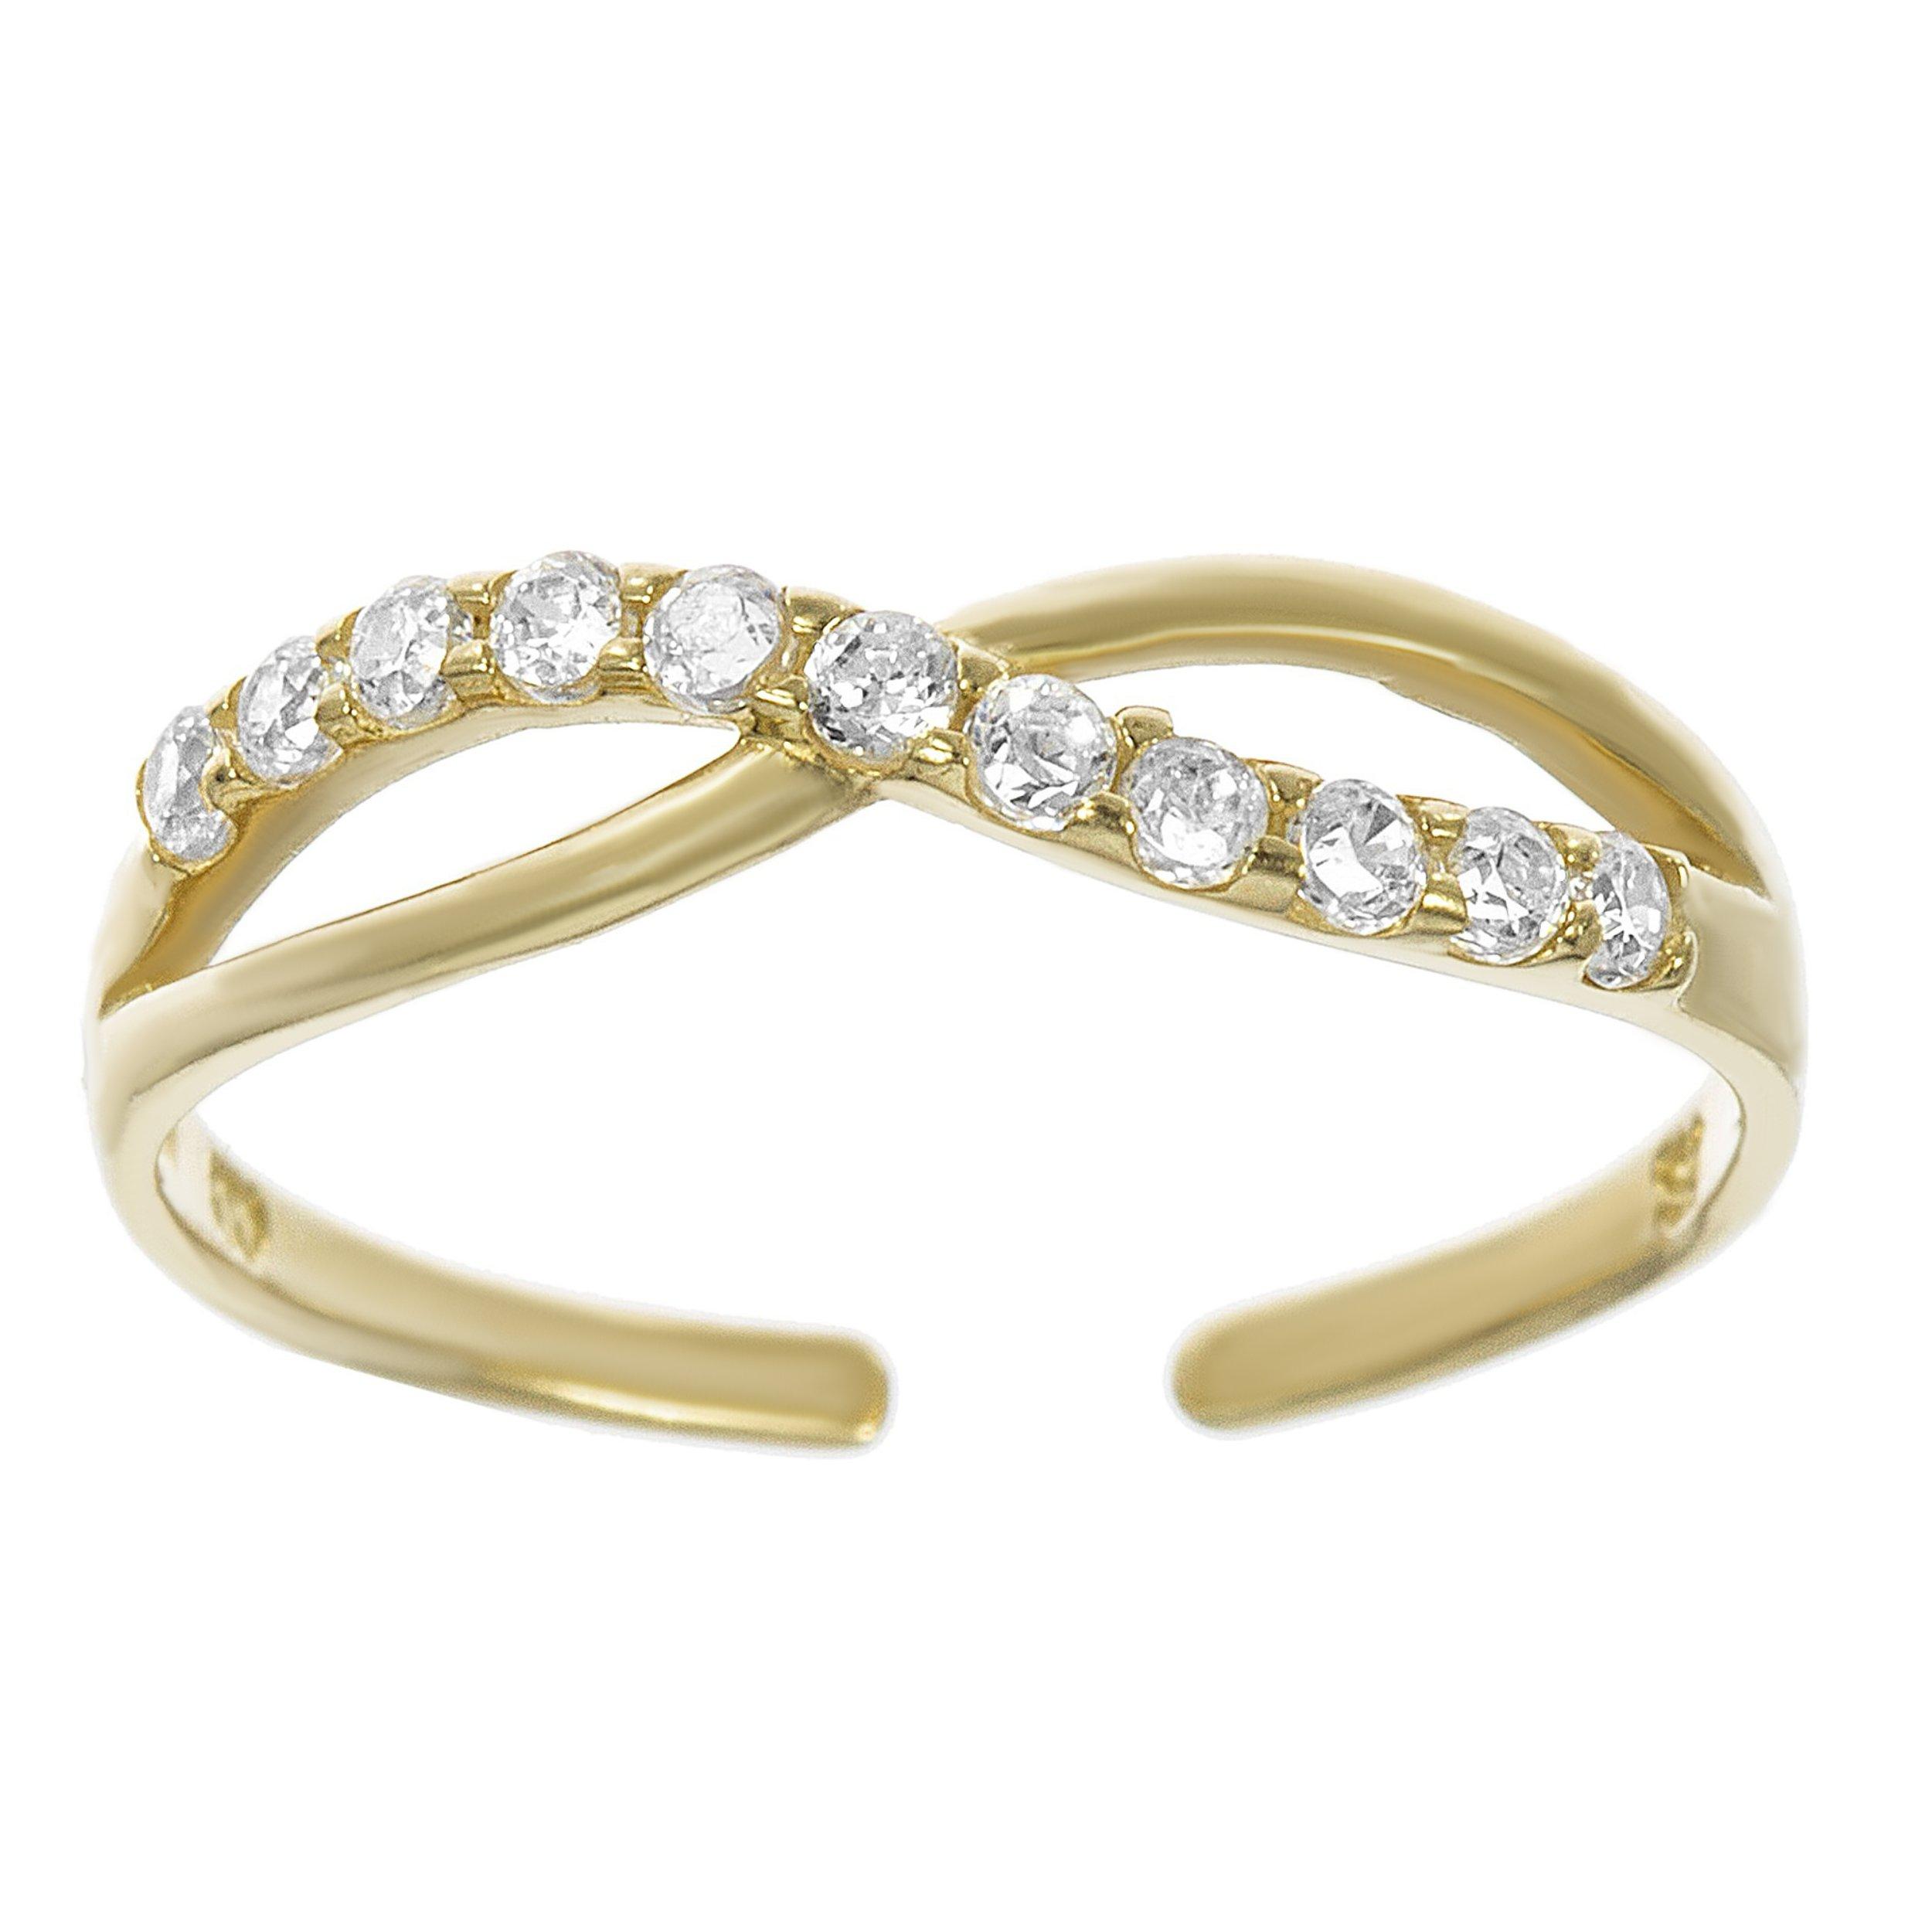 Lavari - 10K Yellow Gold Cubic Zirconium Toe Ring Adjustable by Lavari Jewelers